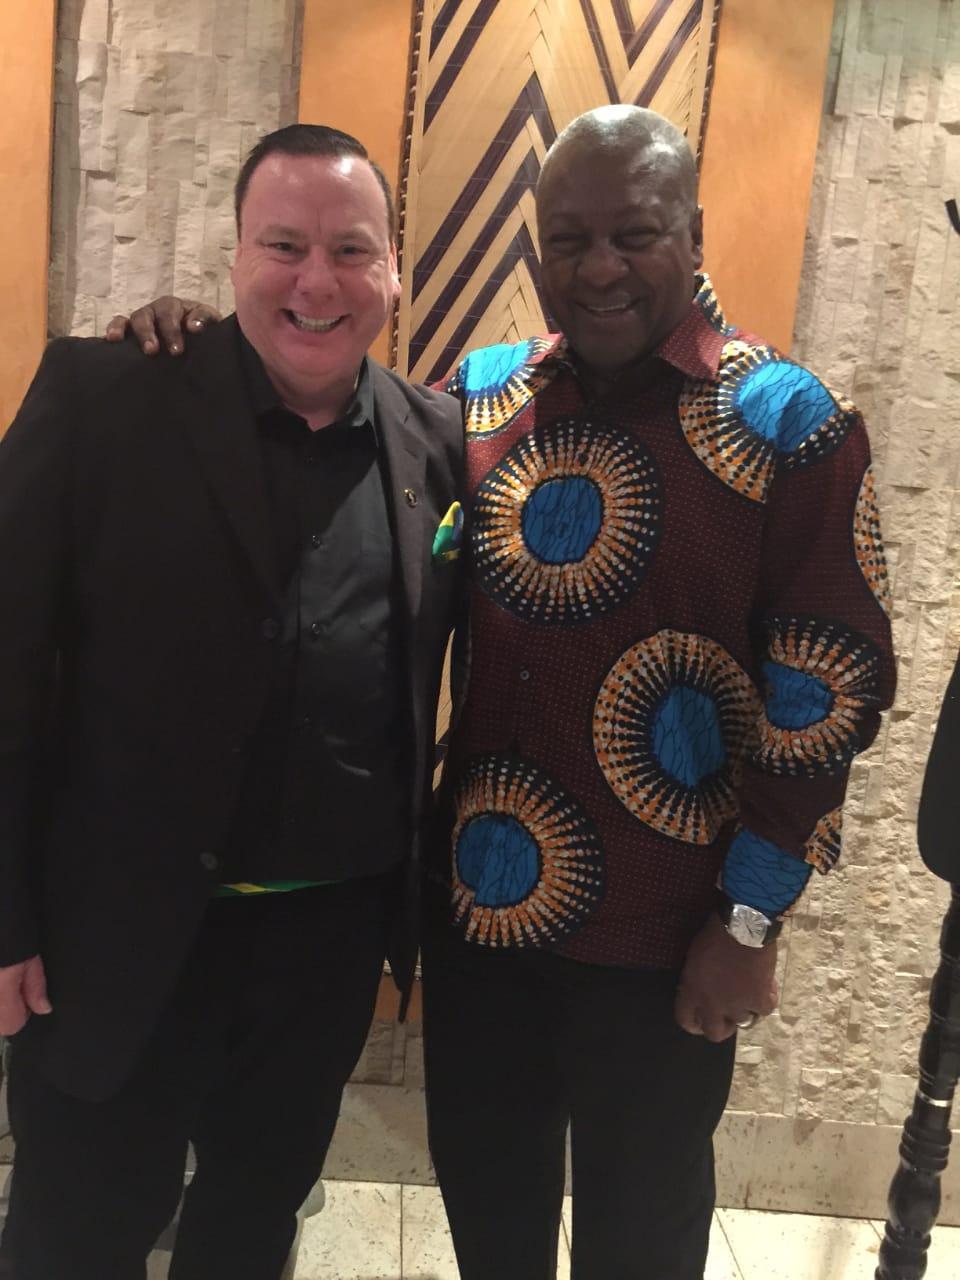 Justin Green, President of the Global Alliance and H.E. John Dramani Mahama, former president of the Republic of Ghana